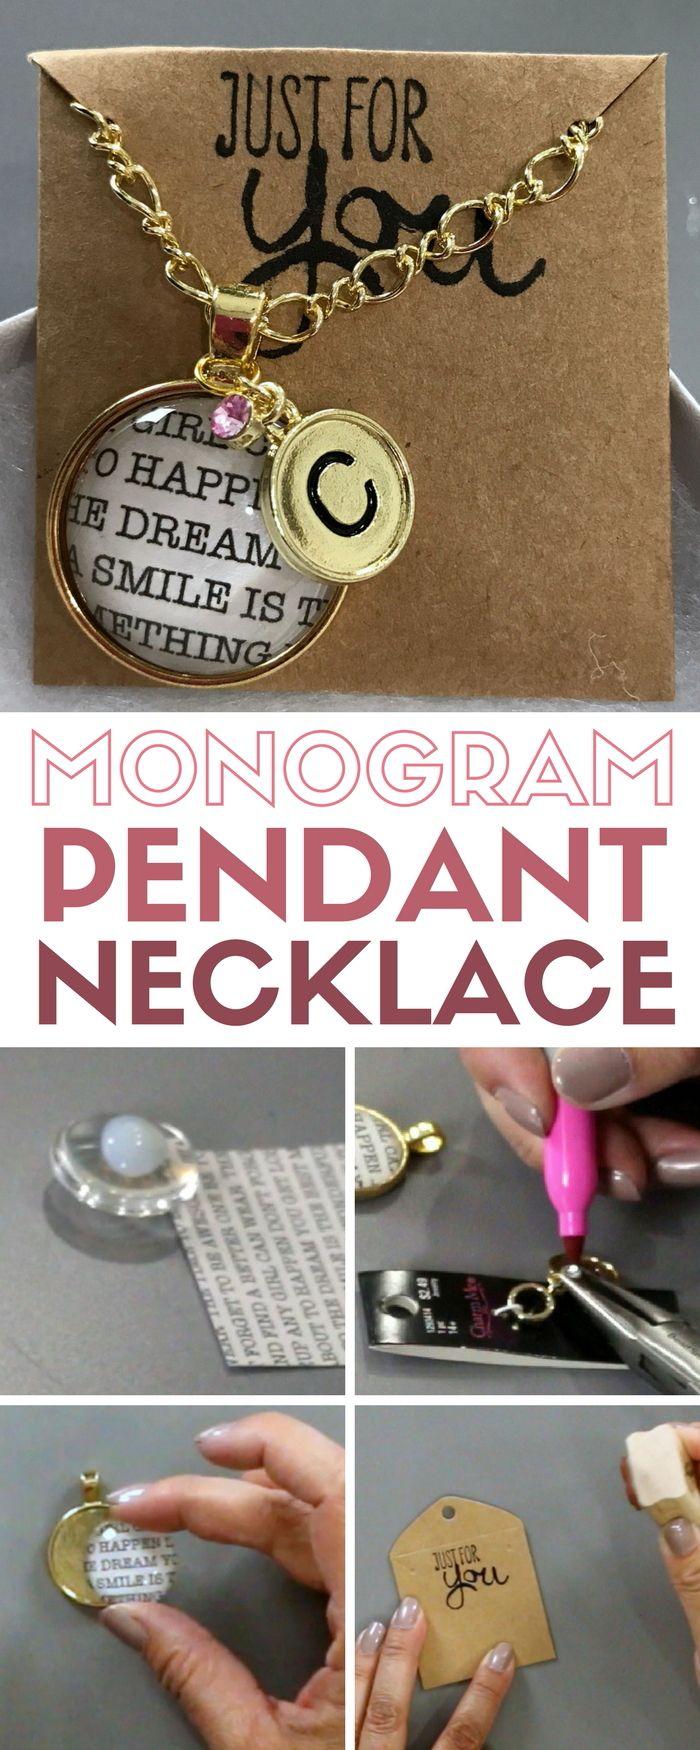 Monogram Pendant Necklace | Beautiful DIY Jewelry | Gold | Handmade Gift | Round | Video Tutorial